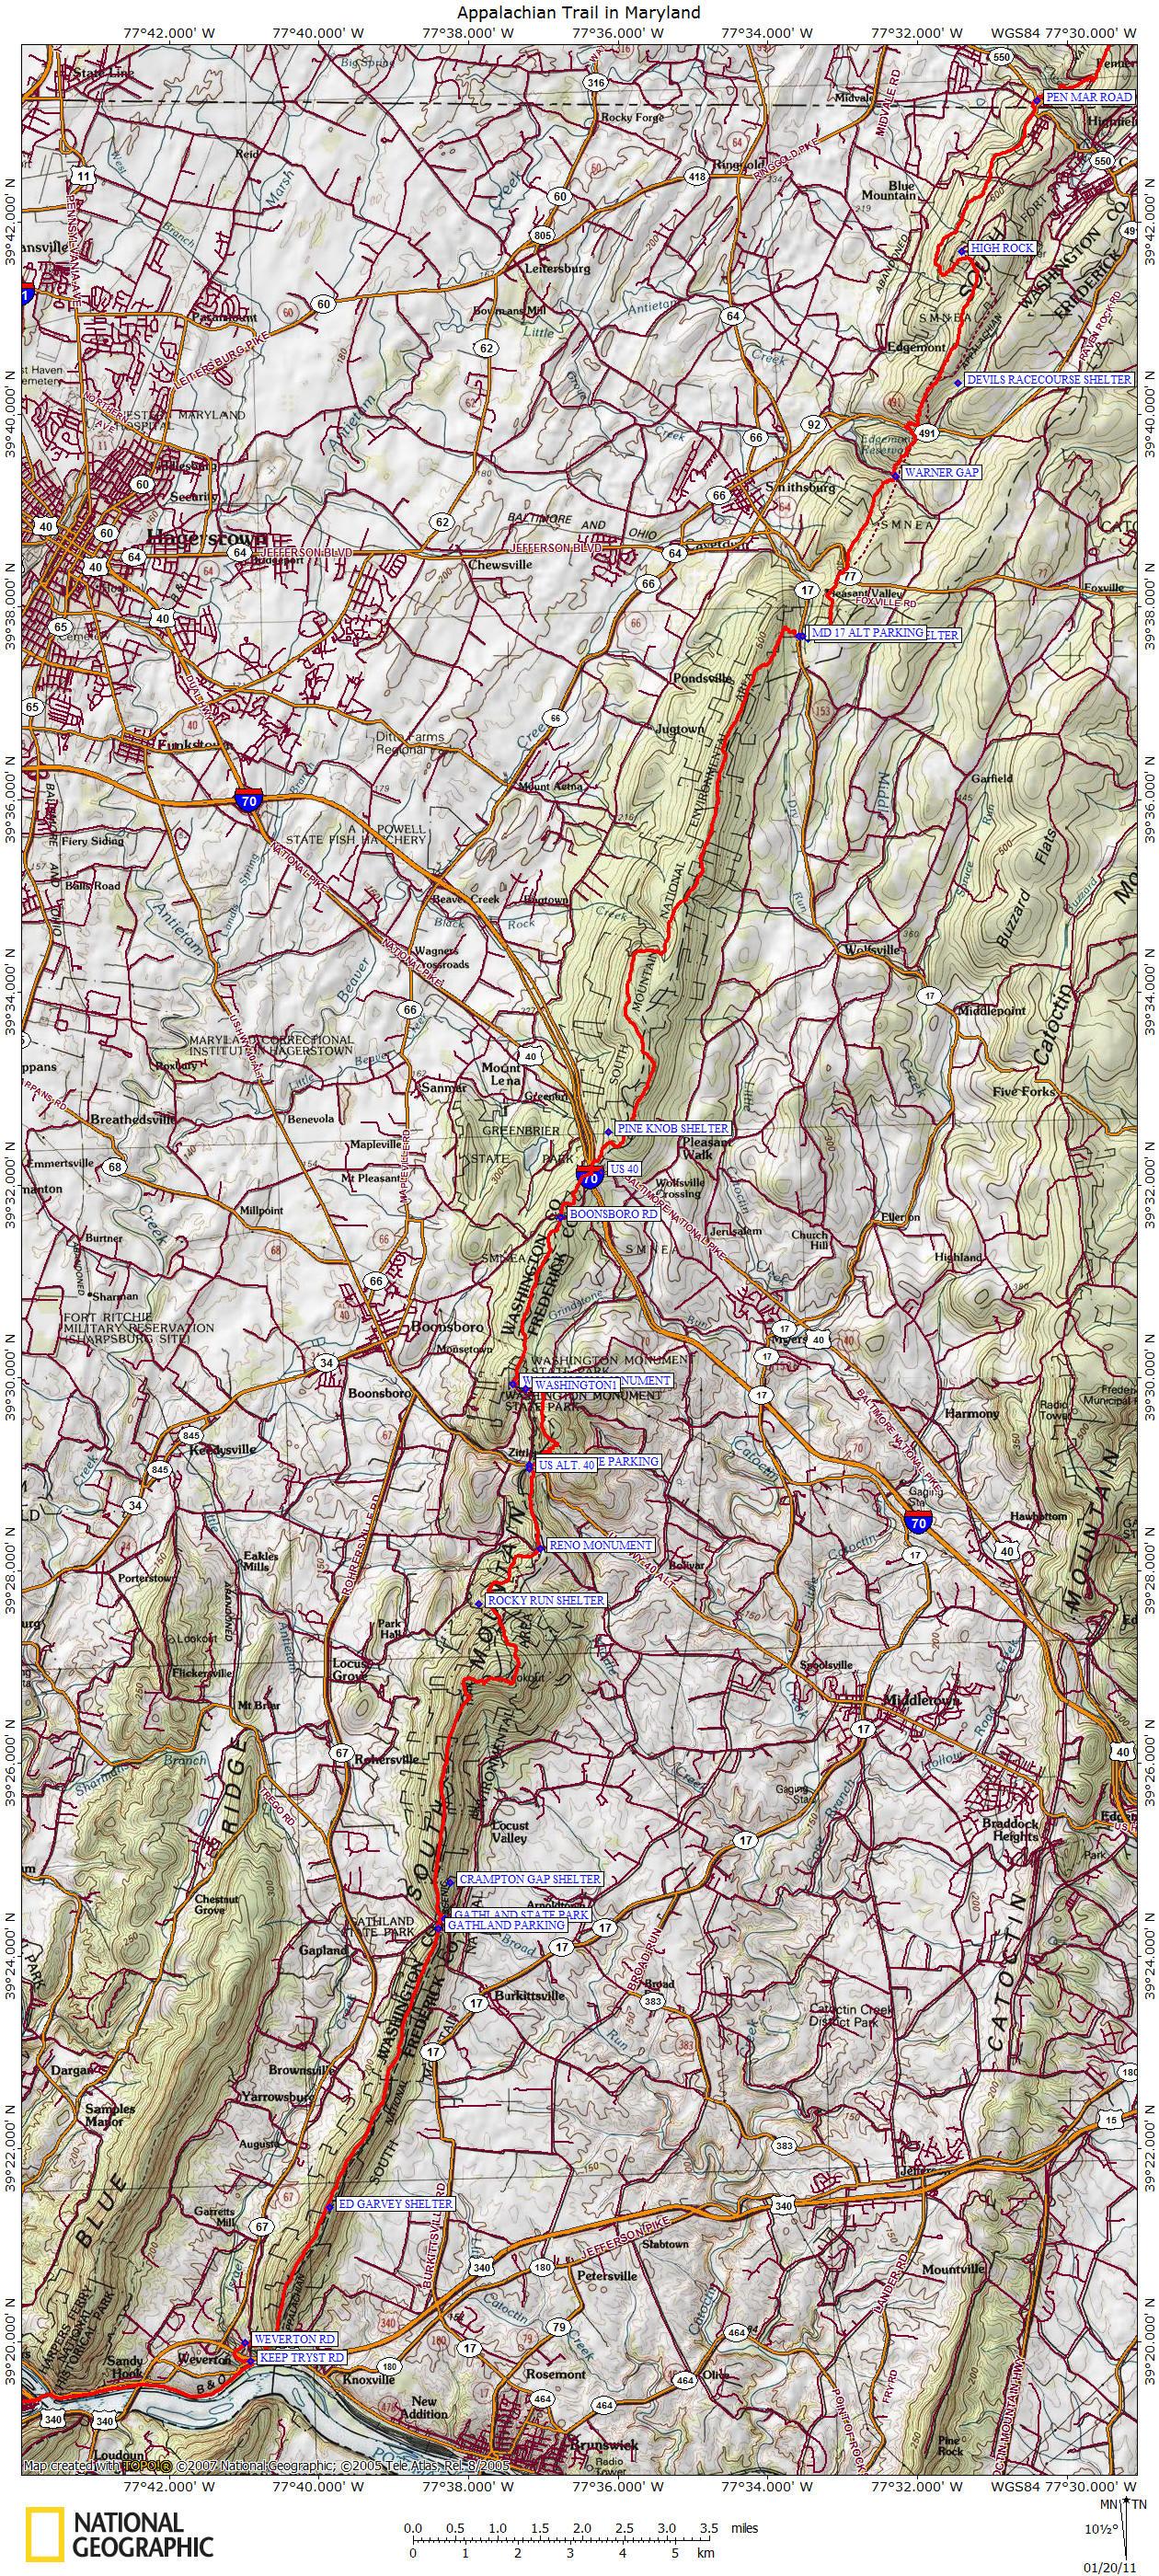 maryland appalachian trail map – bnhspine.com